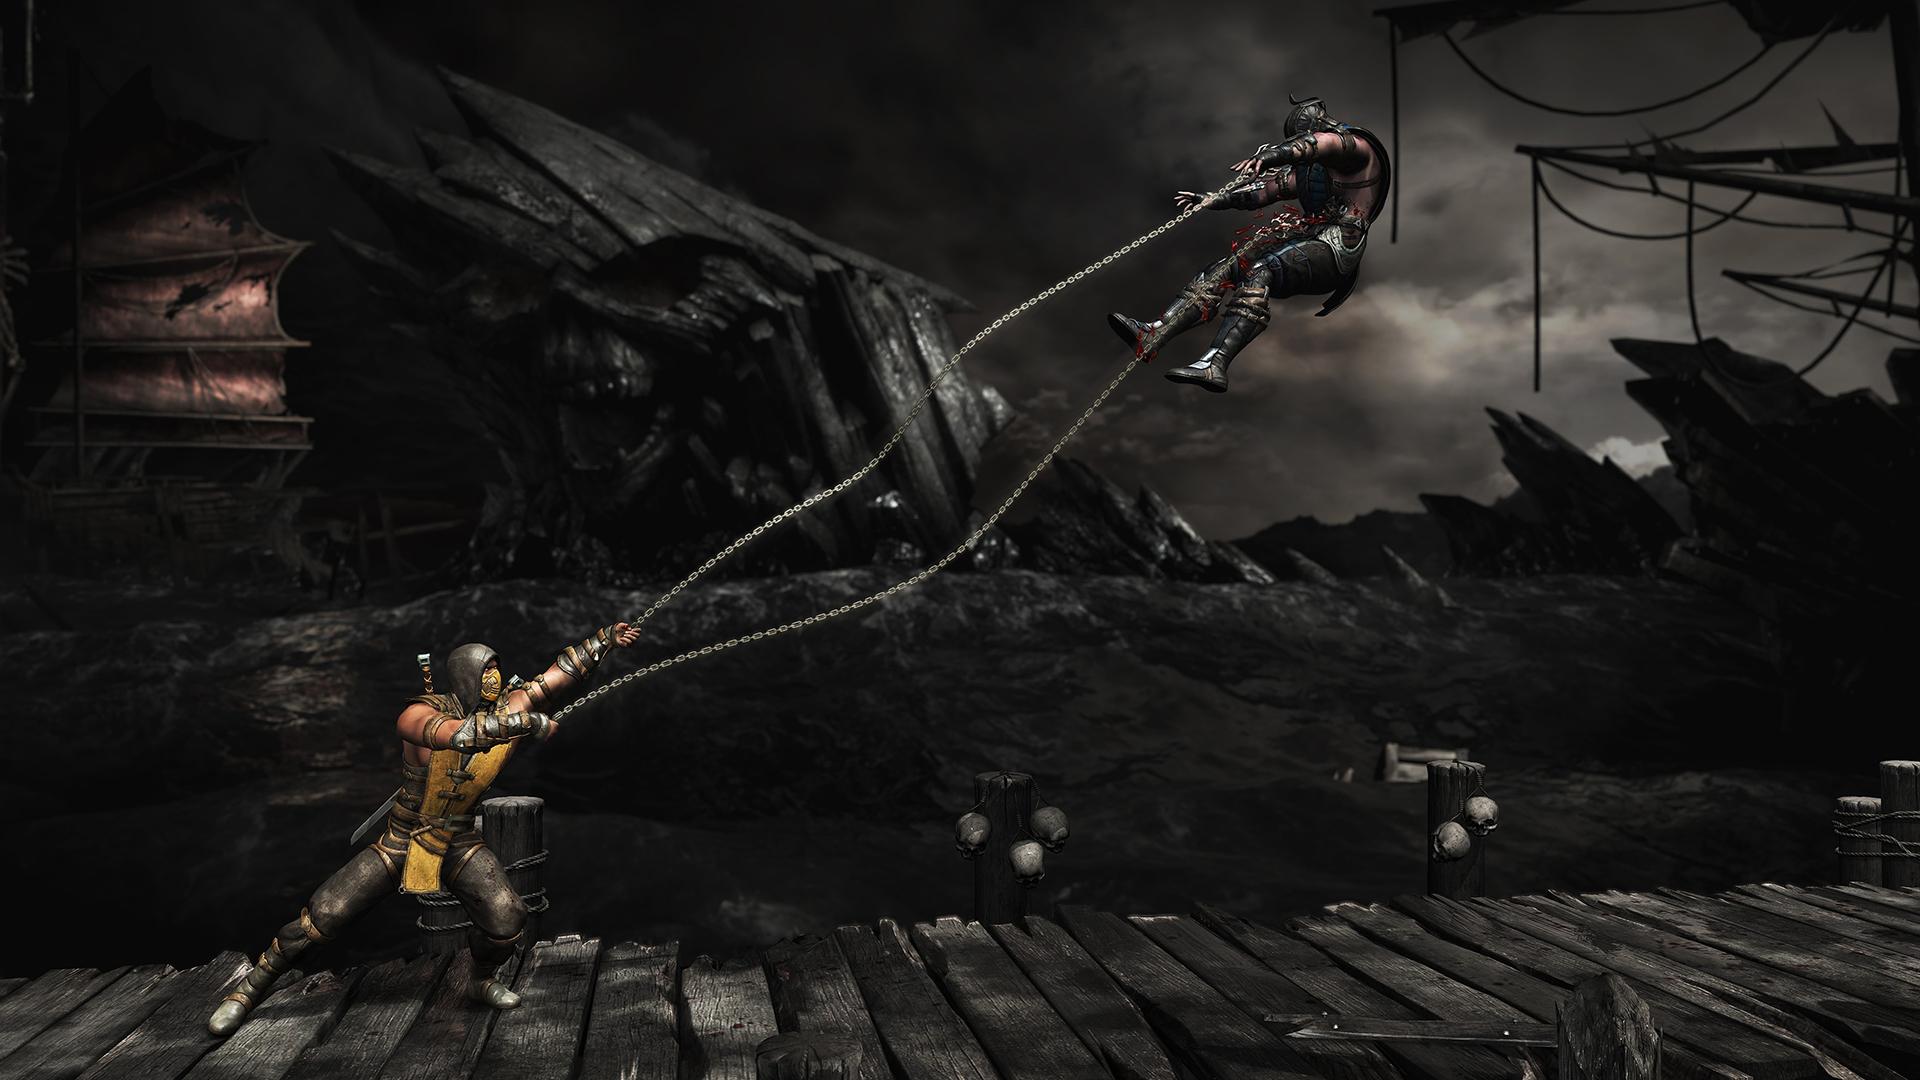 Primeras imágenes oficiales de Mortal Kombat X Lk93u